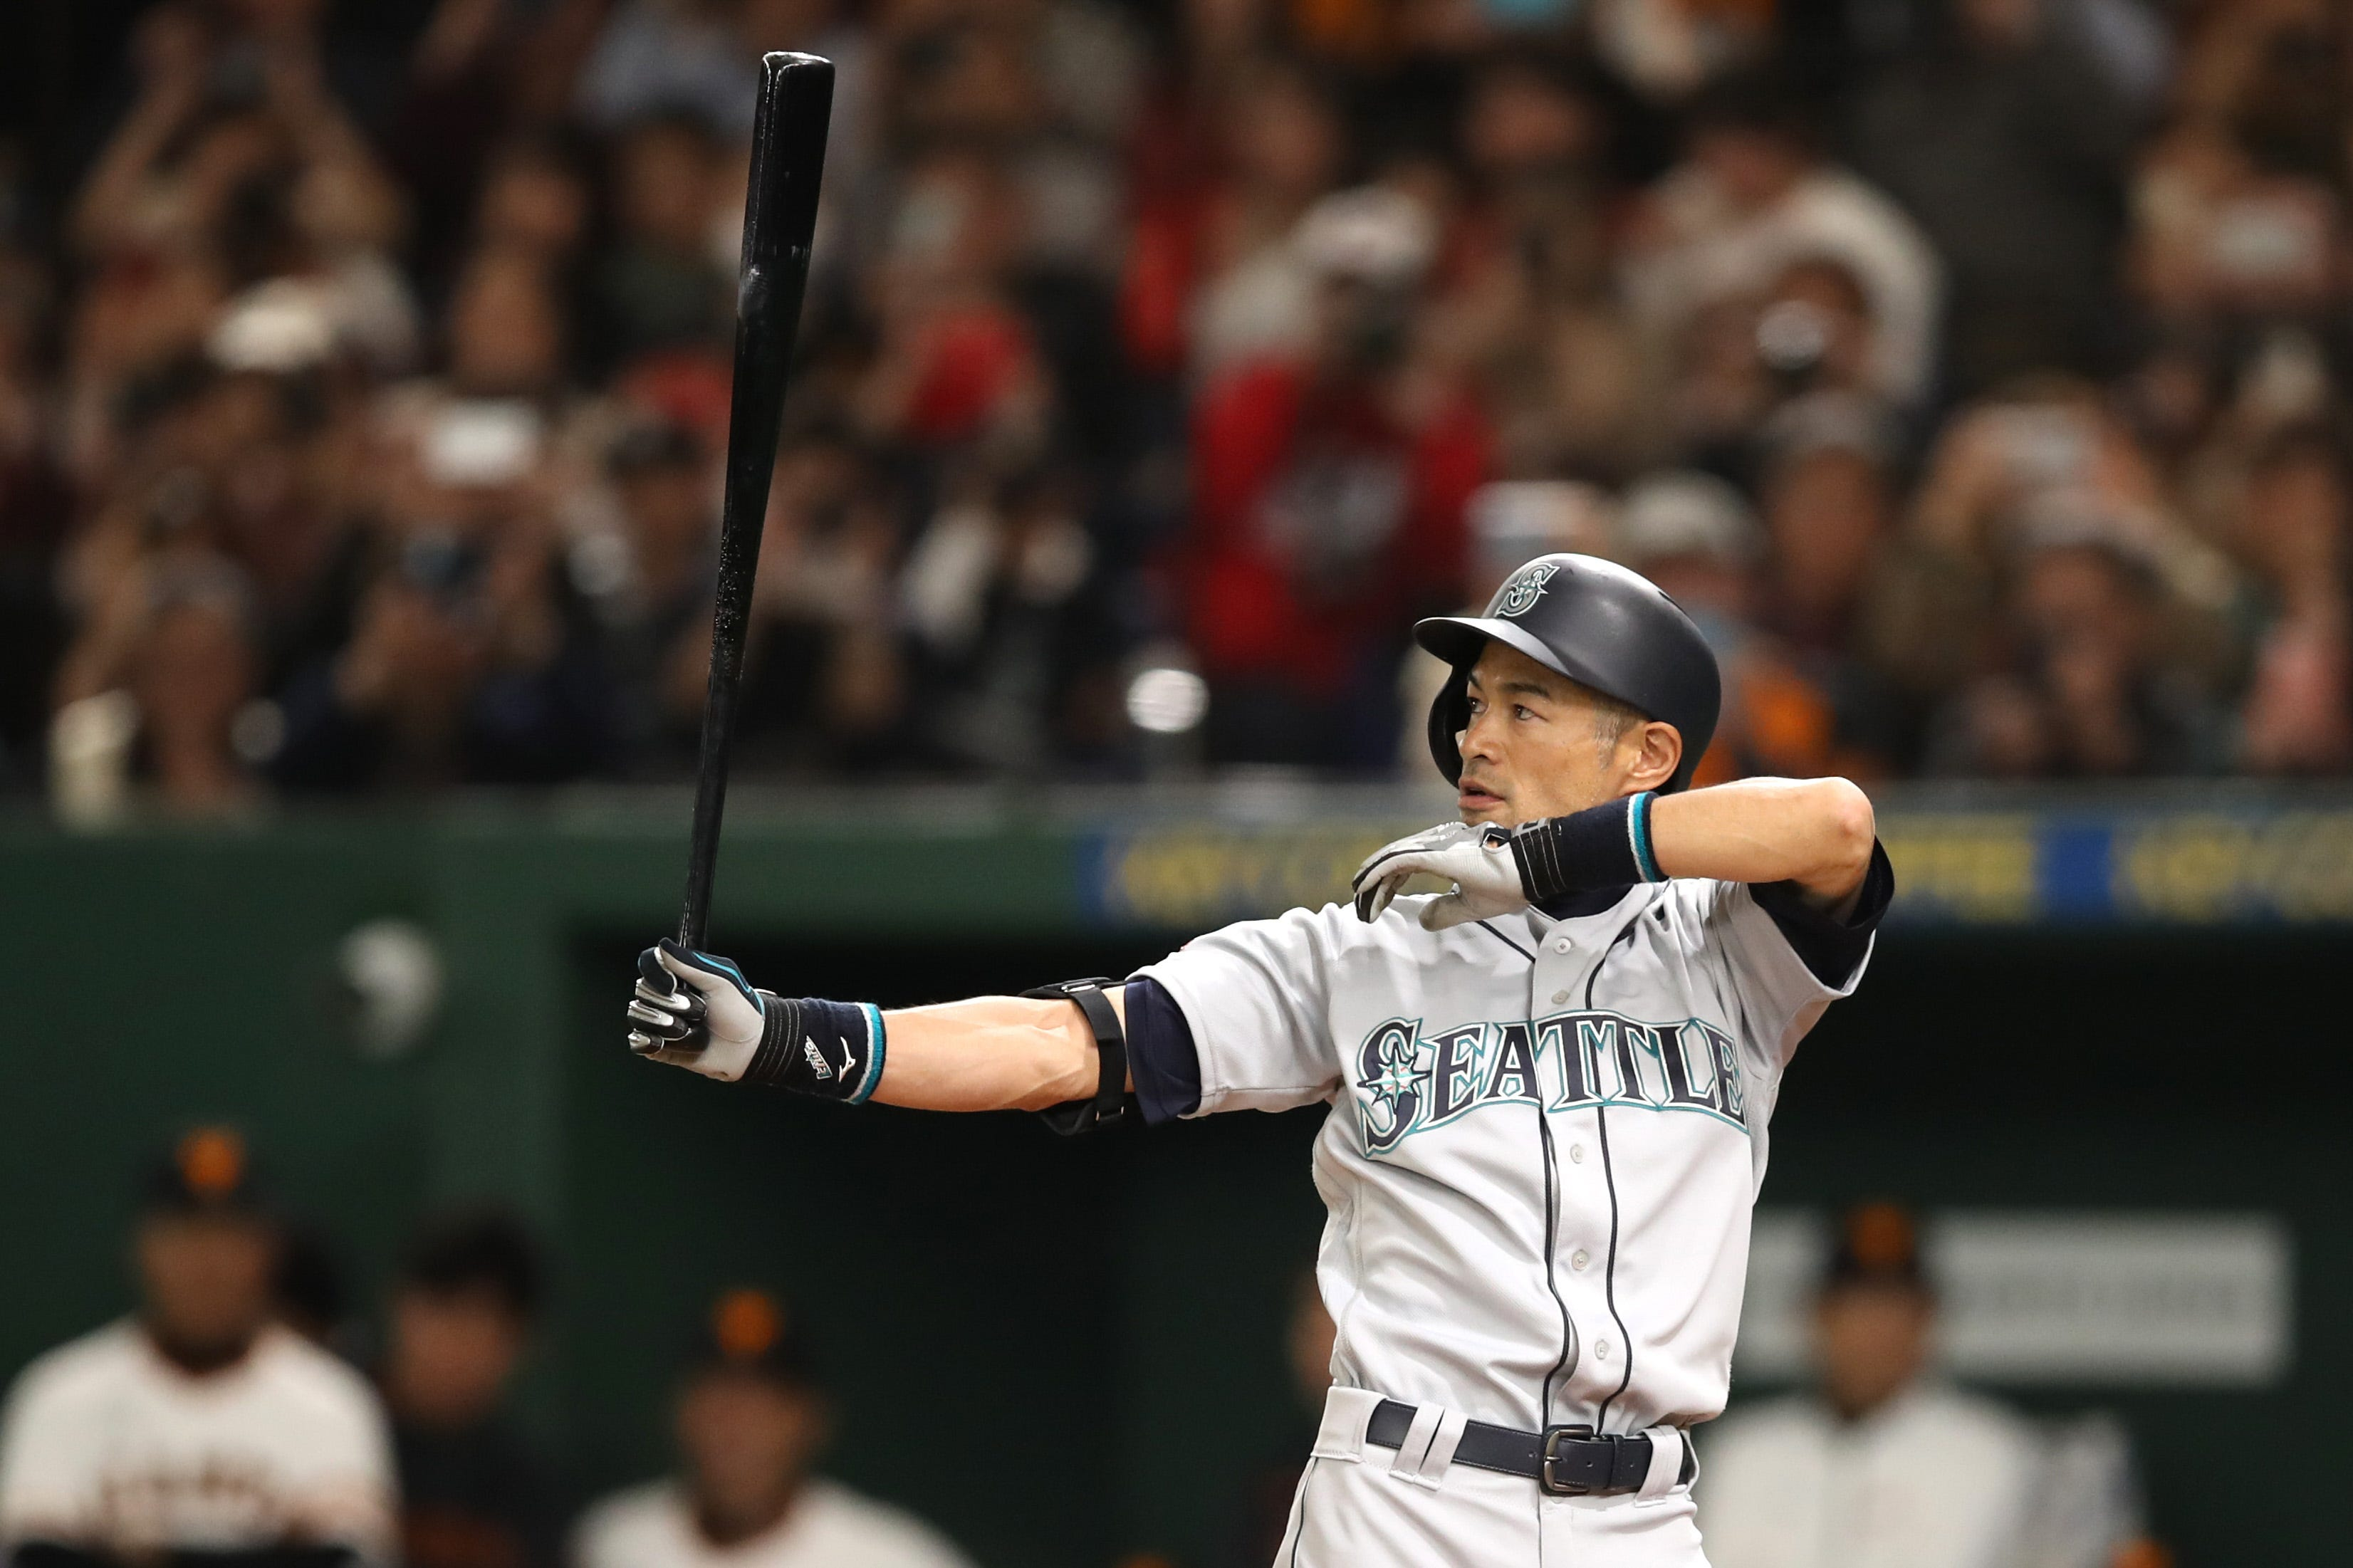 Future Hall of Famer Ichiro Suzuki, 45, to retire after Japan series, per reports